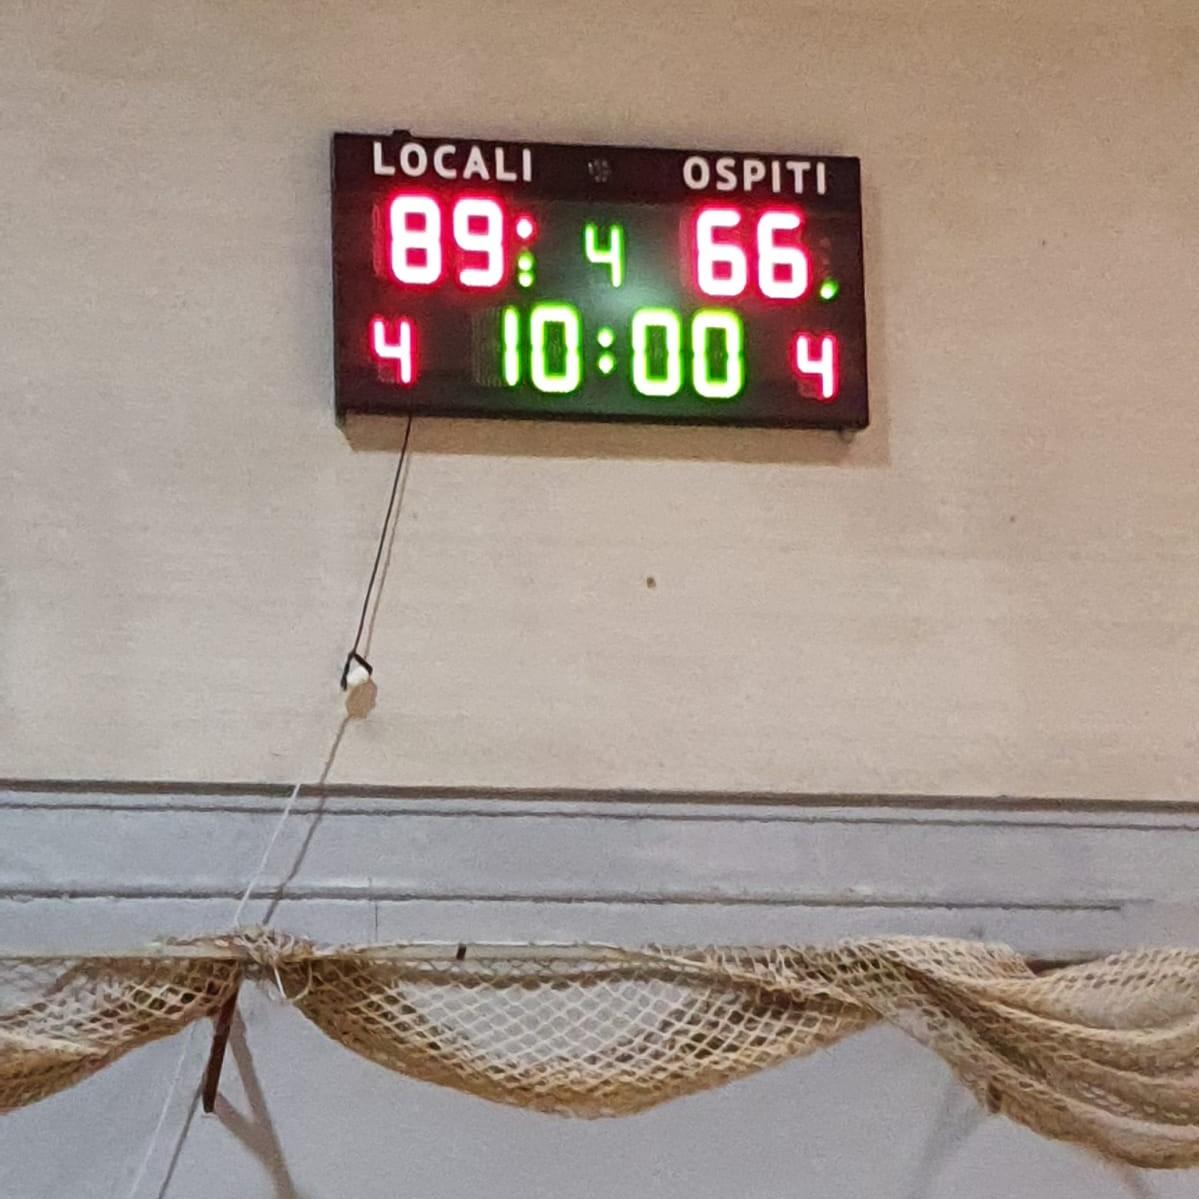 Serie D Castelli Romani - Olimpia Roma 89-66 1